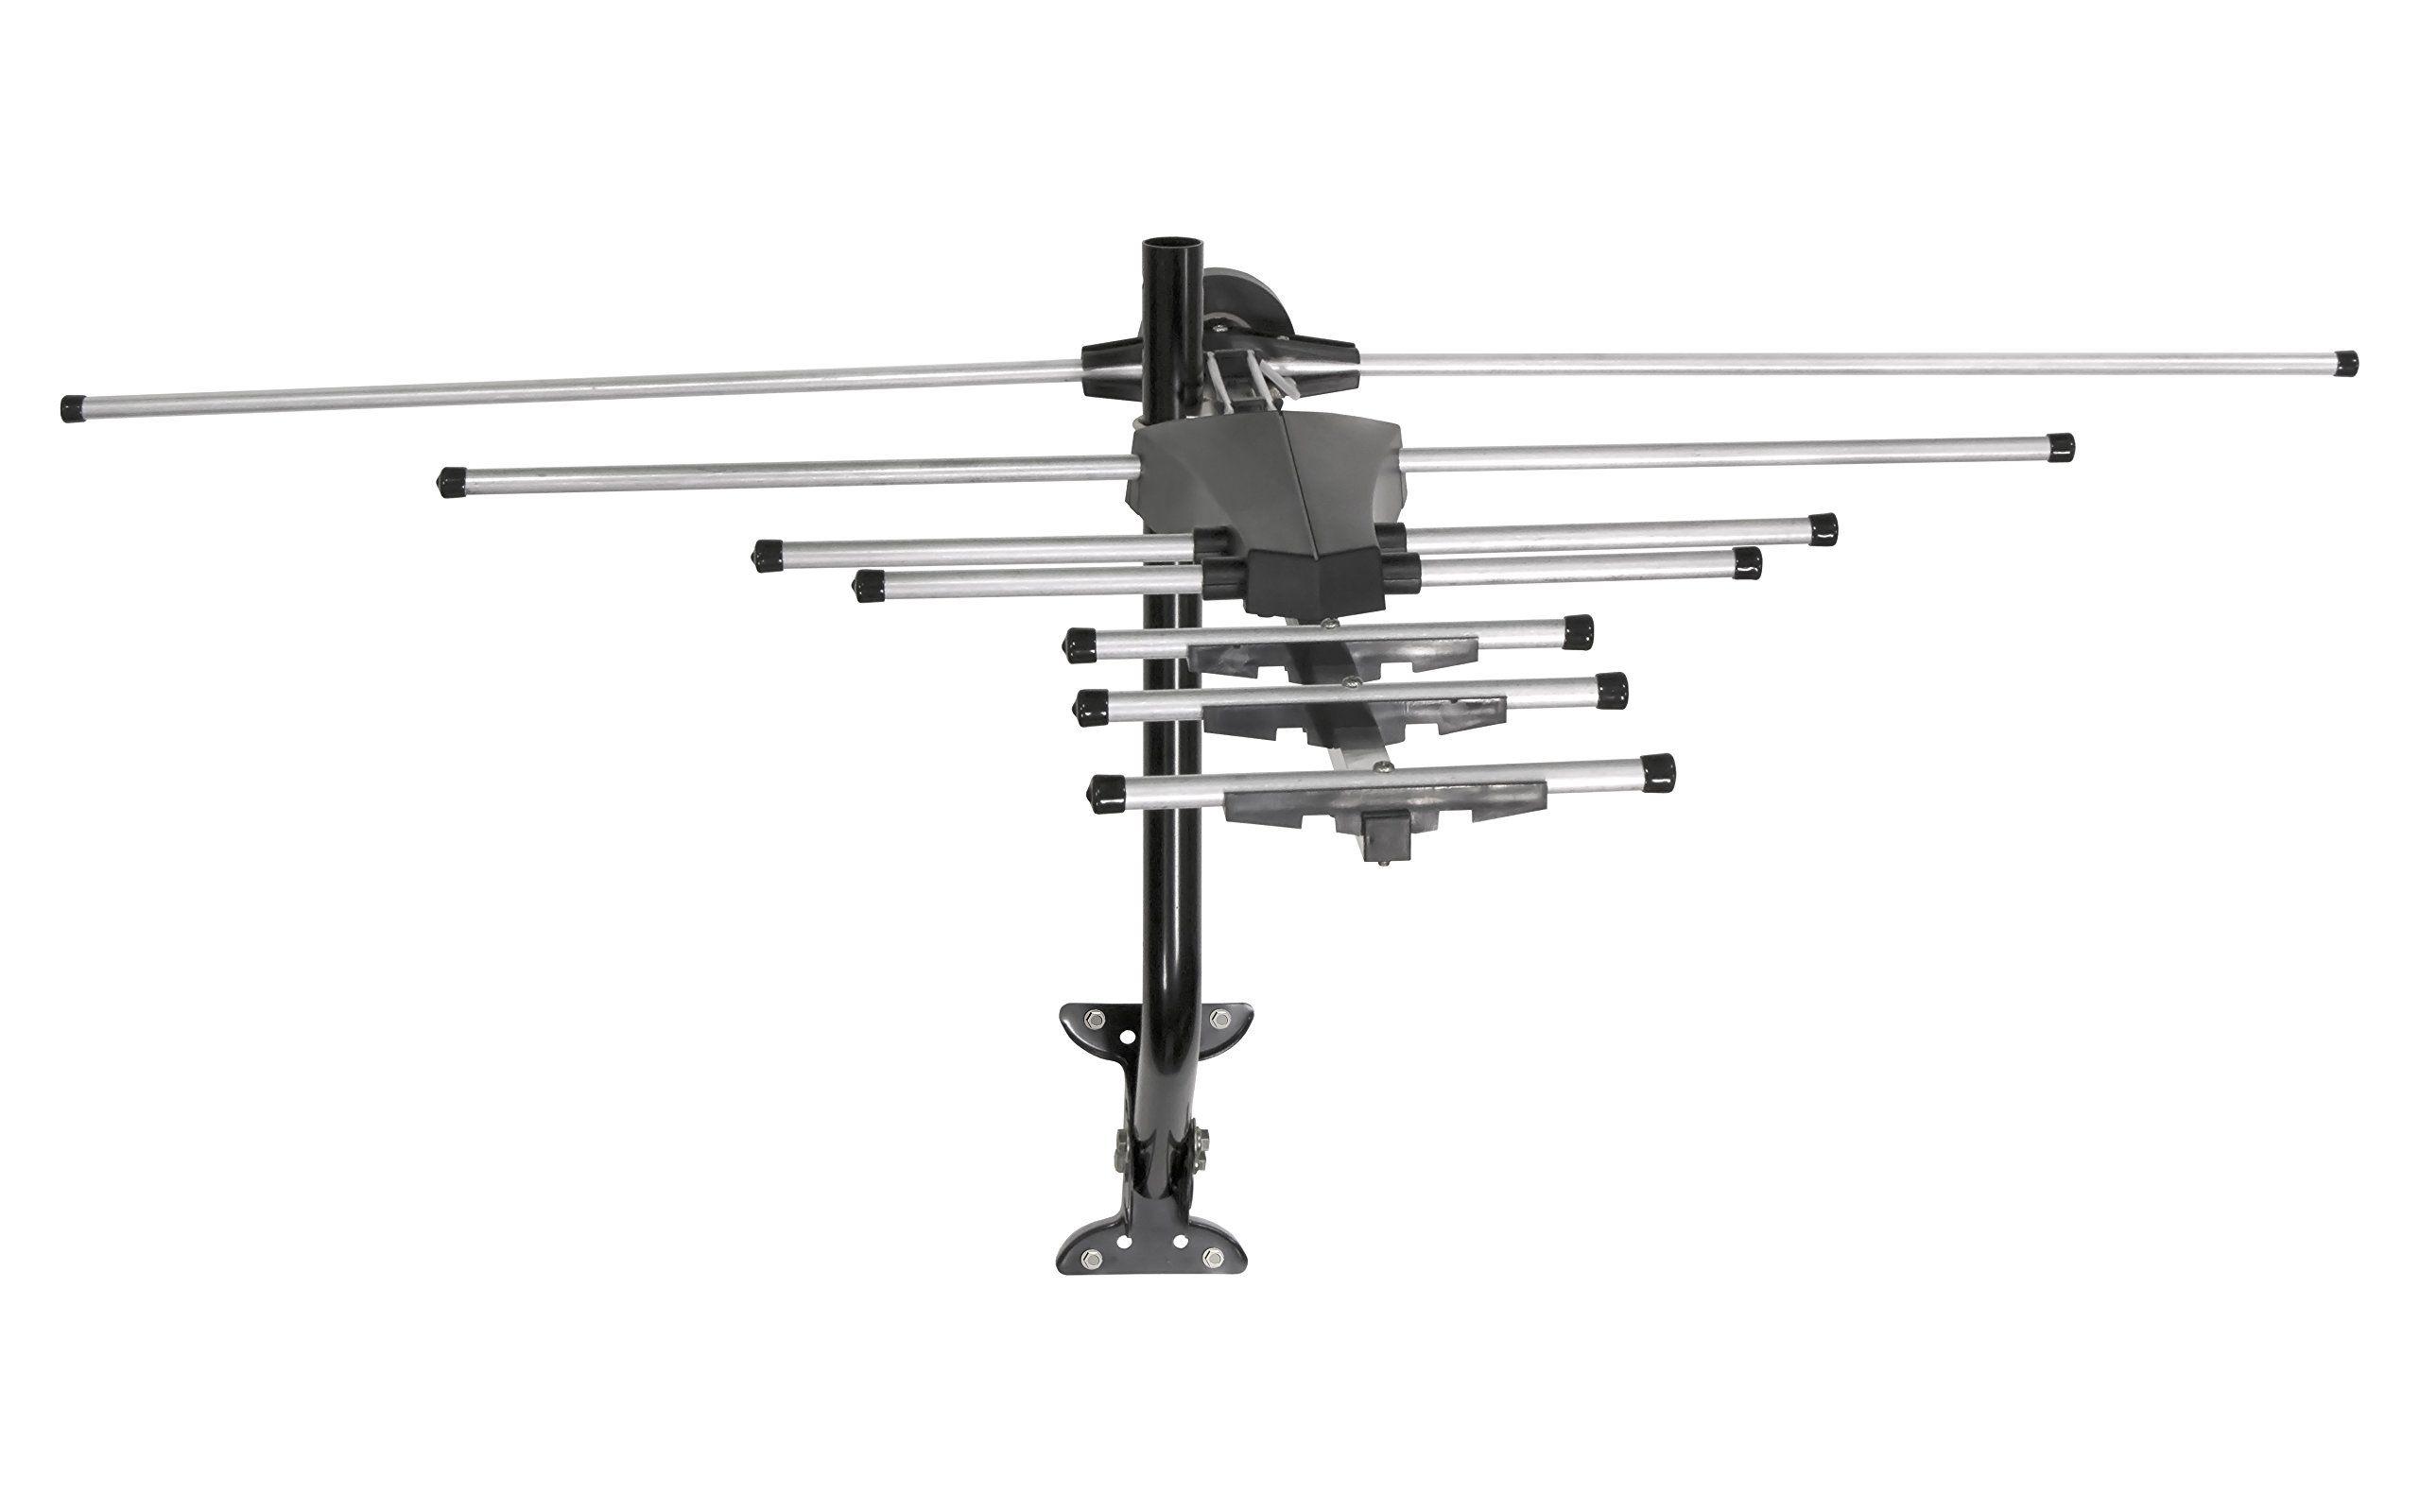 Ge 33685 Pro Outdoor Antenna Long Range Outdoor Attic Yagi Hdtv Antenna For Vhf Uhf Channels 70 Mile R Outdoor Antenna Hdtv Antenna Outdoor Tv Antenna